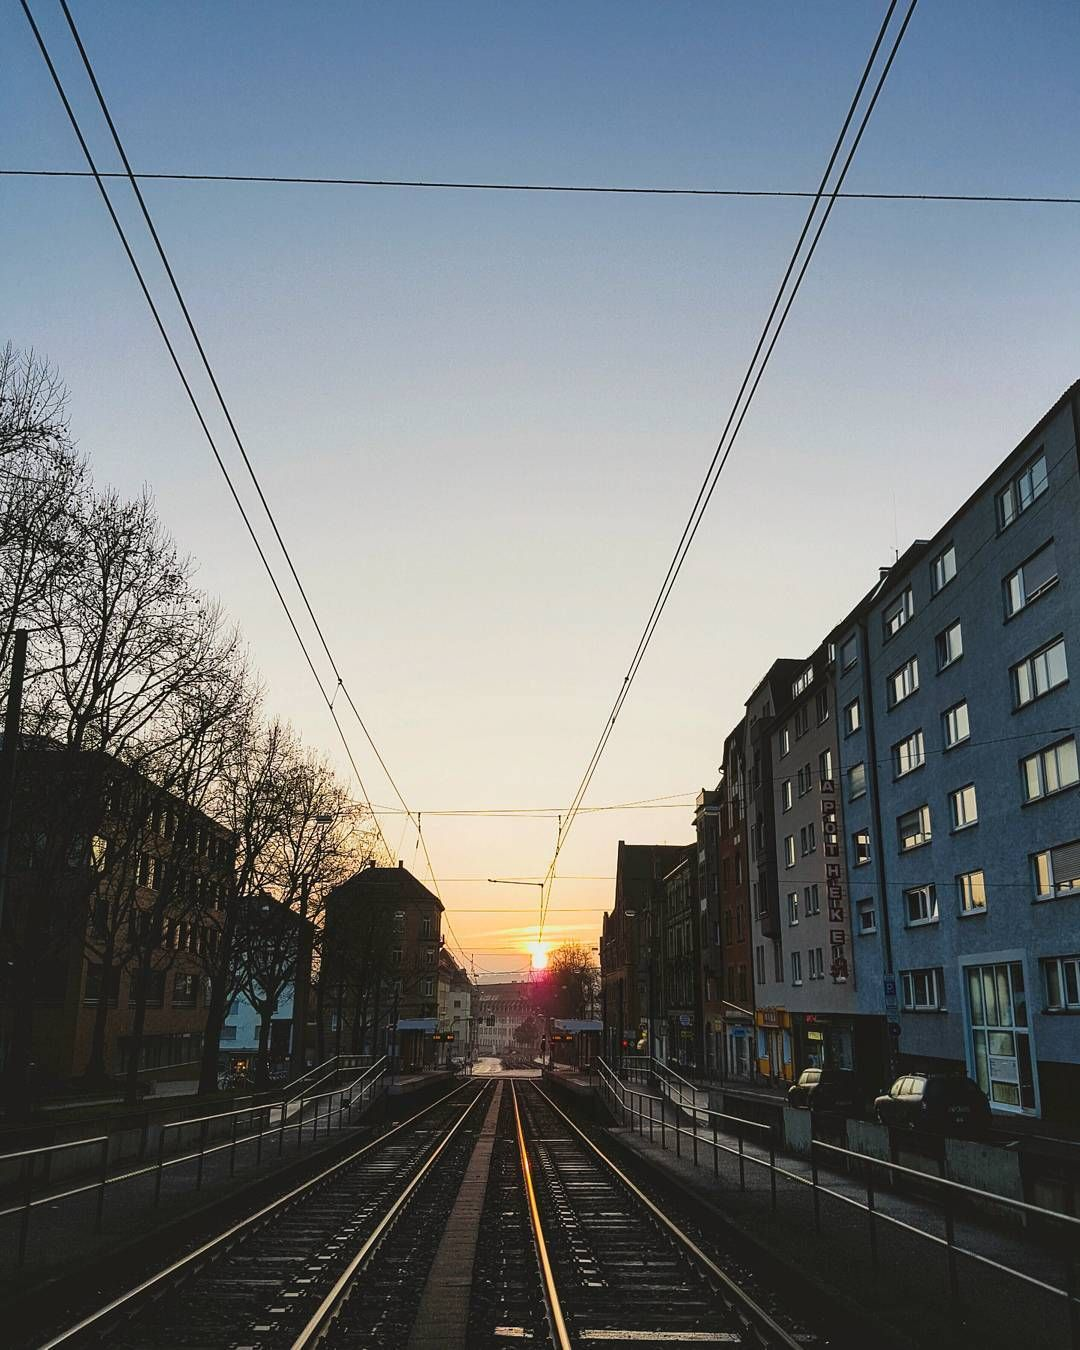 Rise and shine #stuttgart 🌇 #morning in #stuttgartcity  #ig_stuttgart #ig_deutschland #stuttgartliebe #enjoystuttgart #visitstuttgart #deutschland_greatshot #stuggi #stuggilove #0711